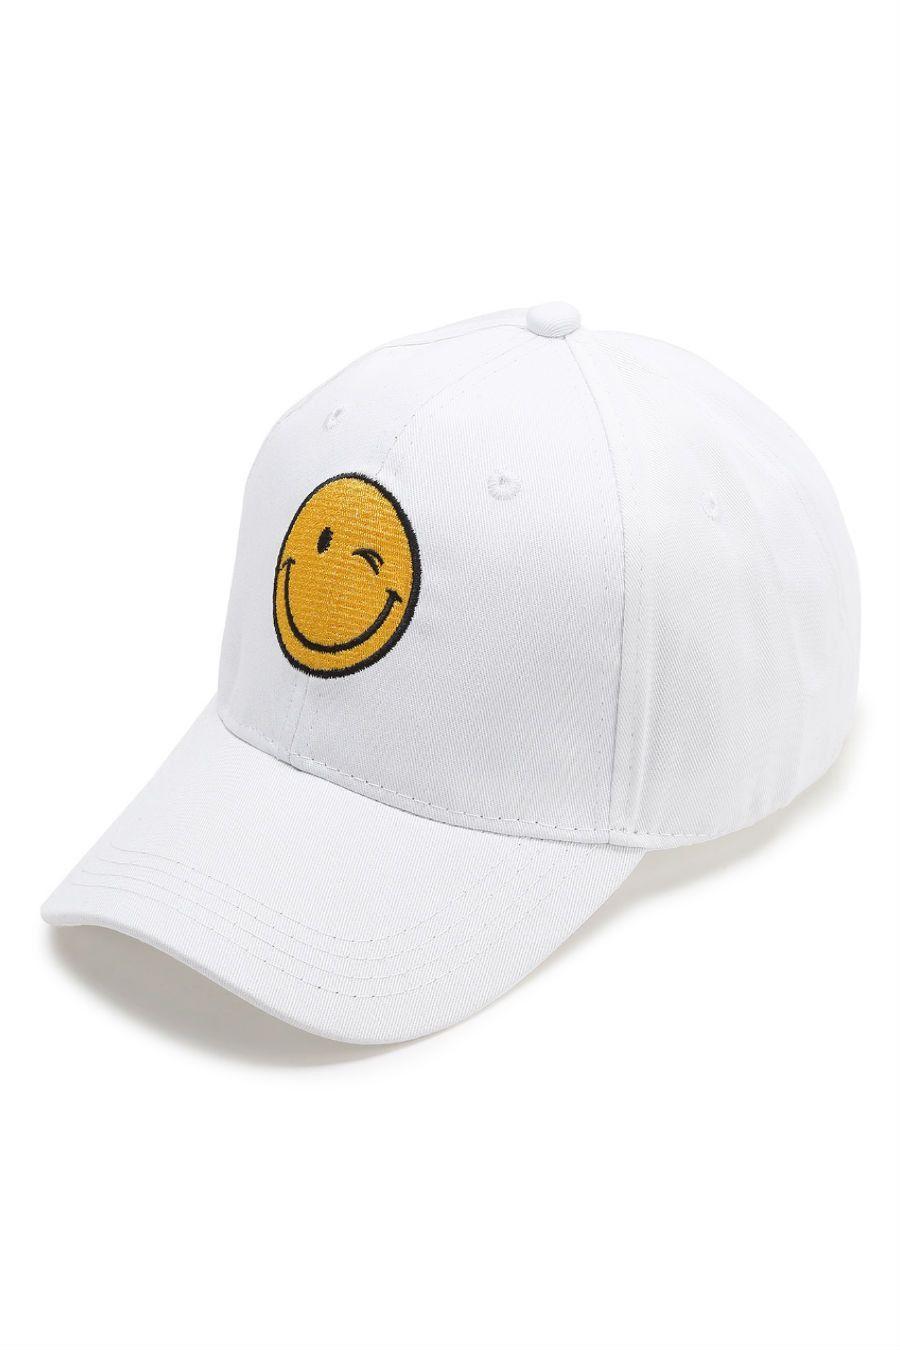 31d2de55d53 Smile Face Emoji Embroidery Baseball Cap